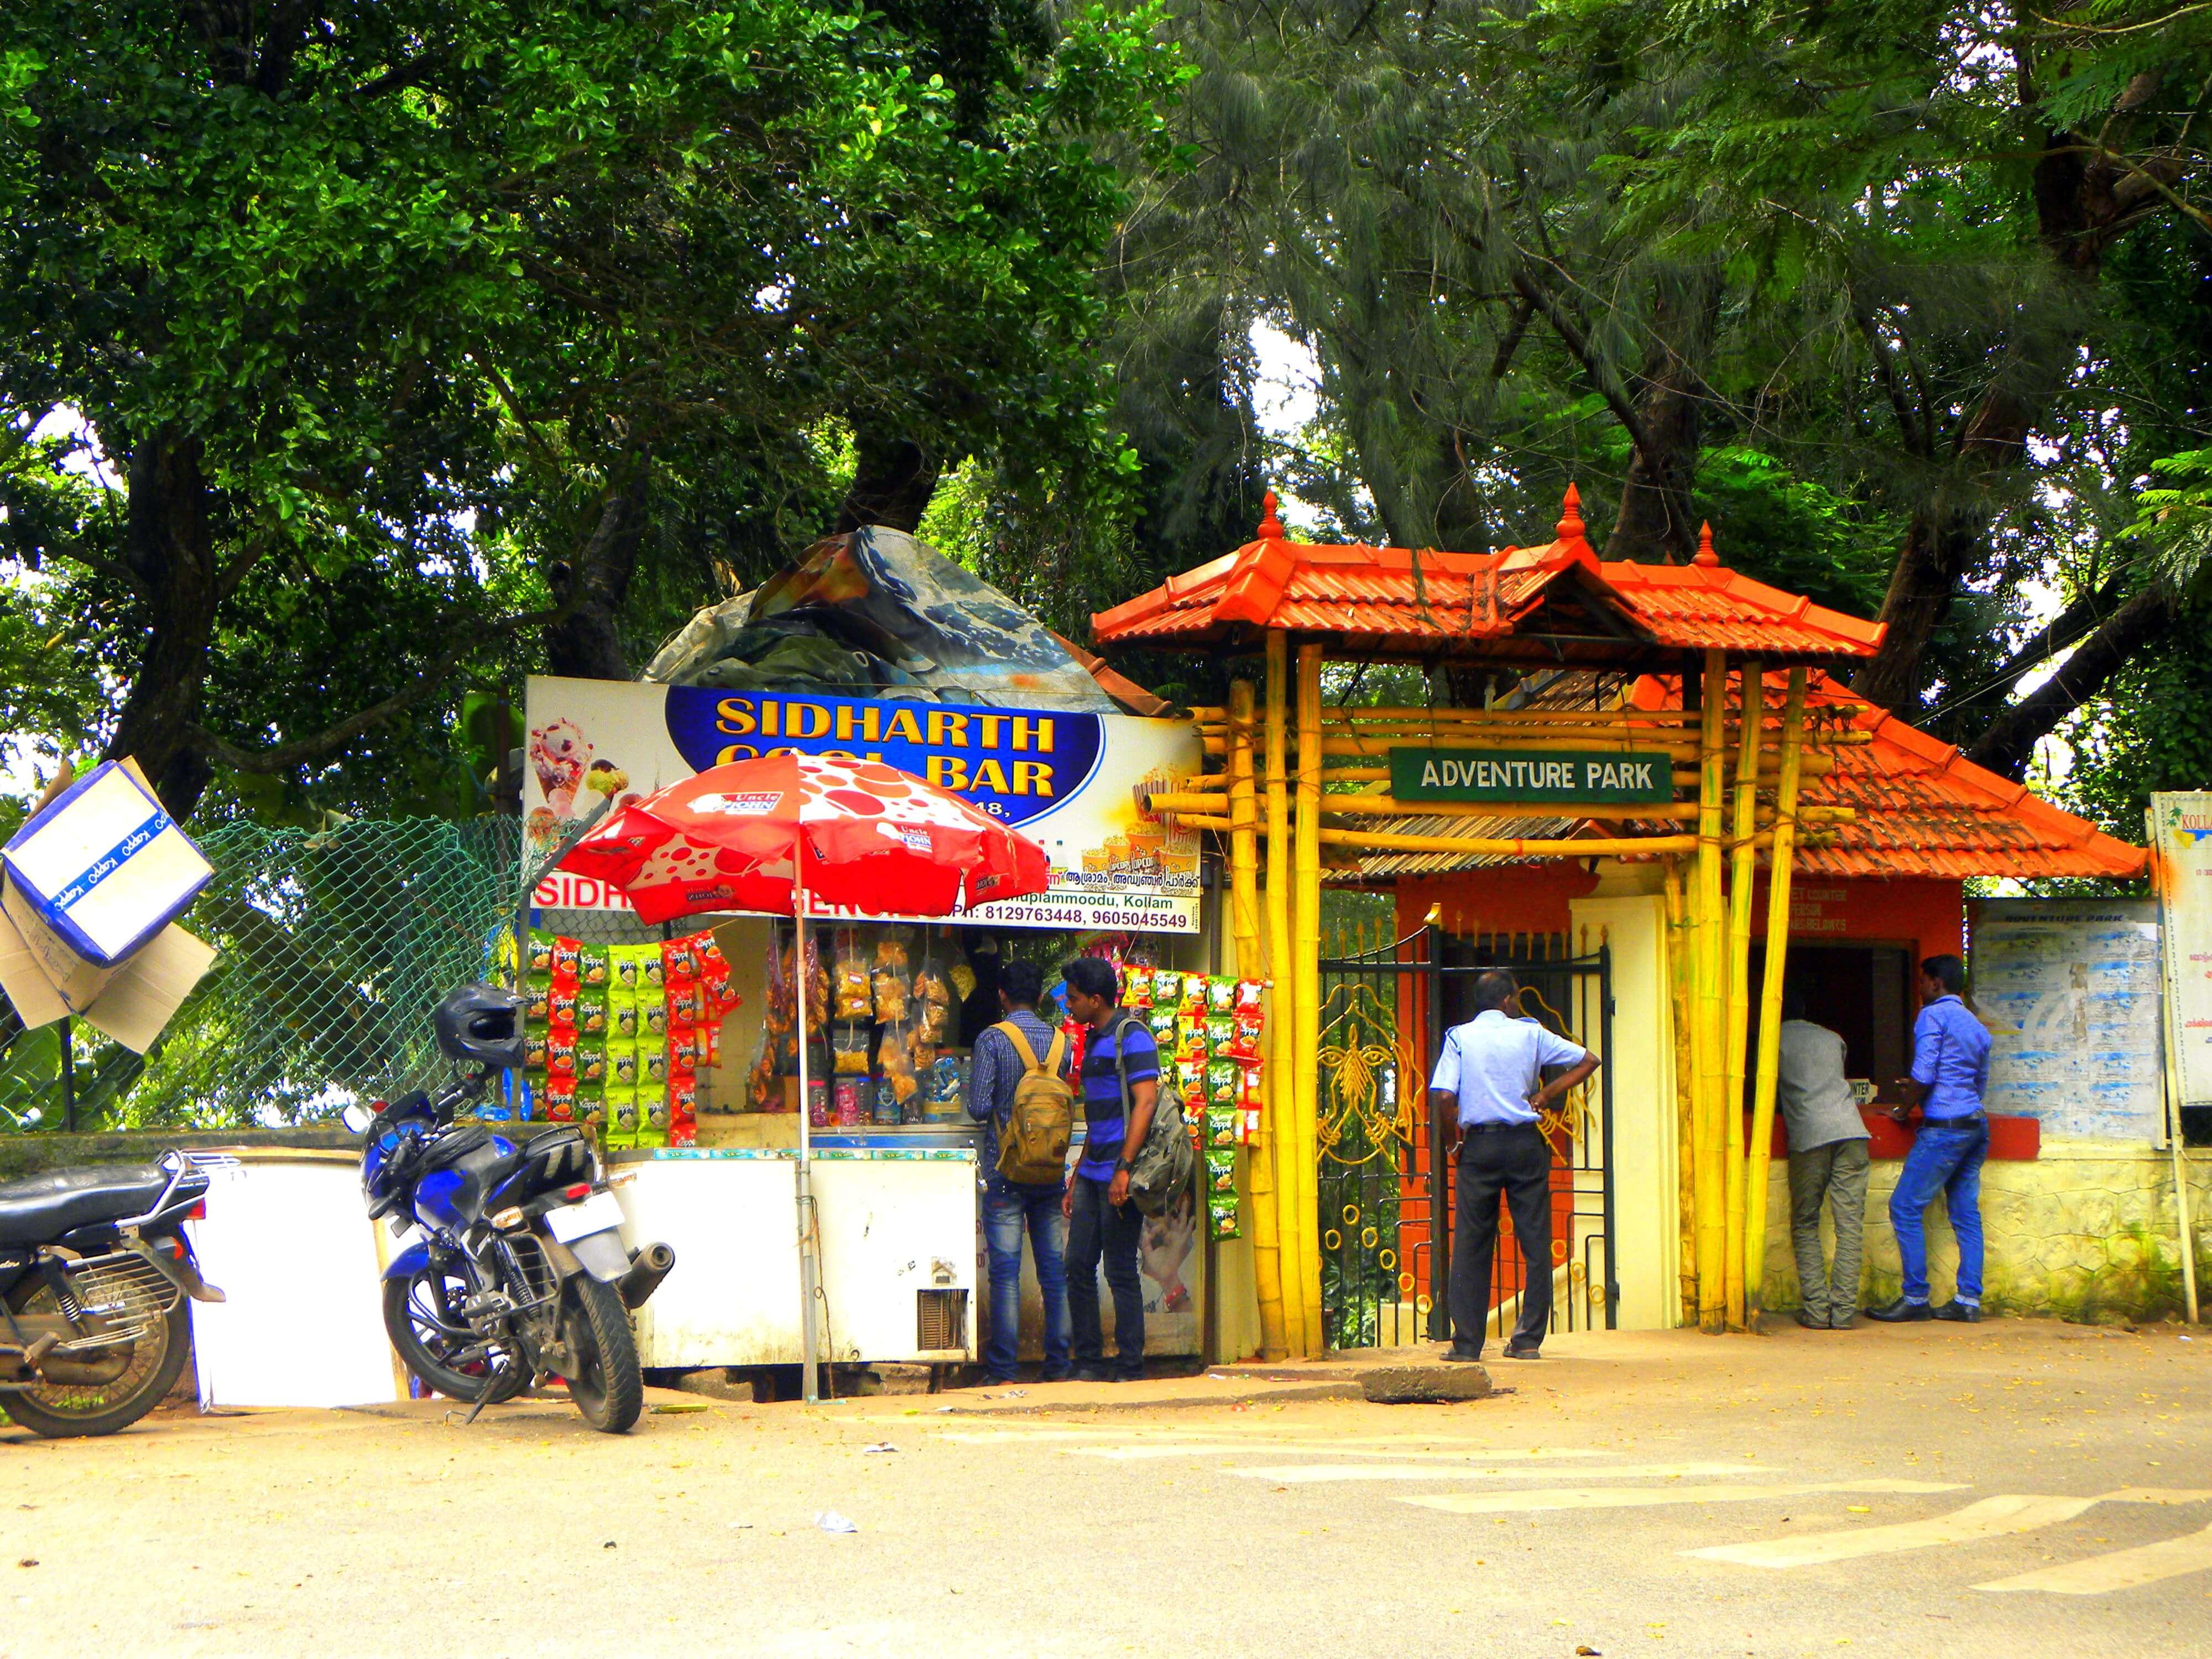 entrance of Asramam adventure park in Kollam